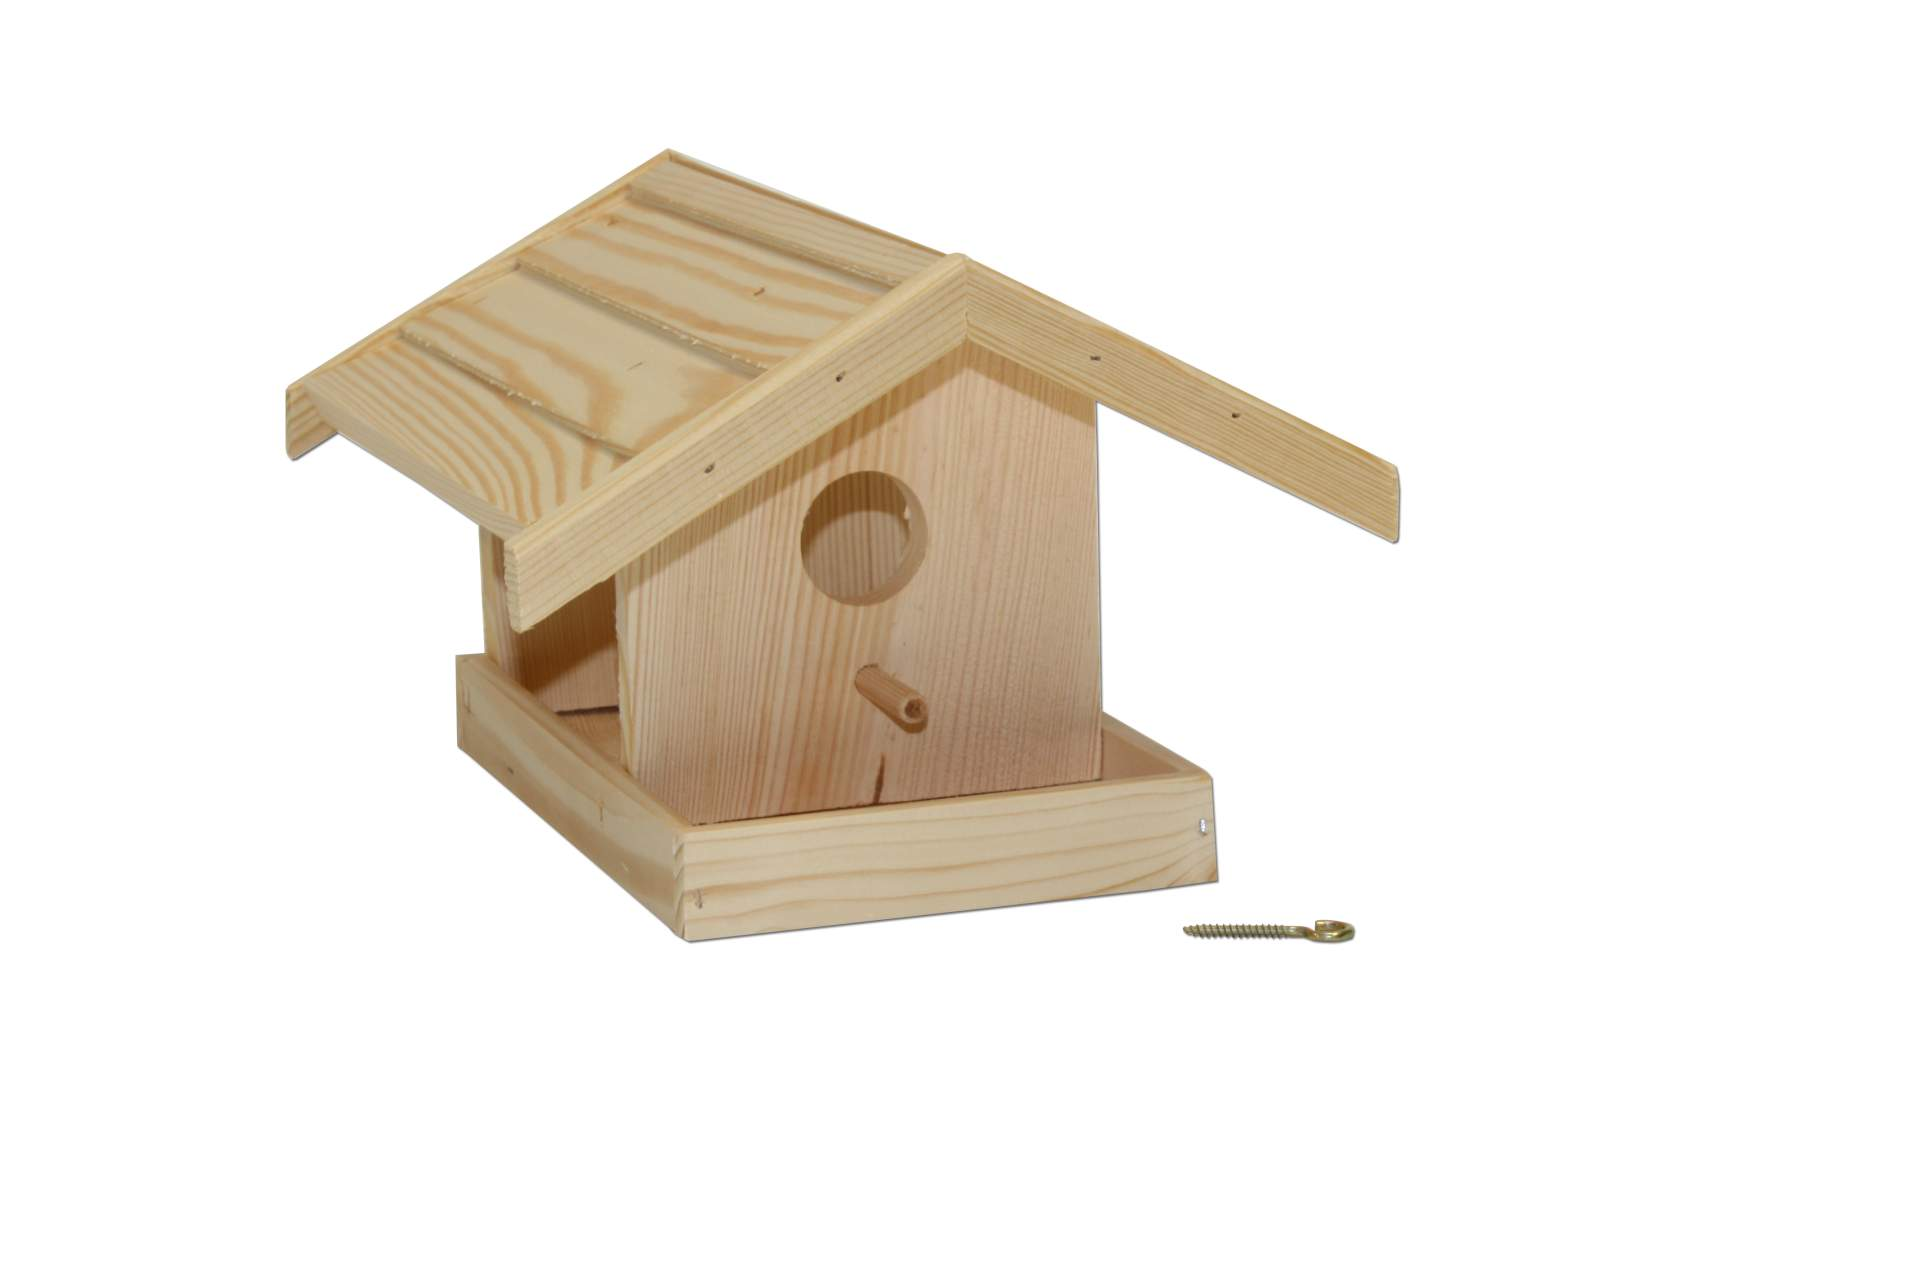 vogelhaus zum individuellen bemalen naturbelassen h uschen vogel futter haus neu ebay. Black Bedroom Furniture Sets. Home Design Ideas